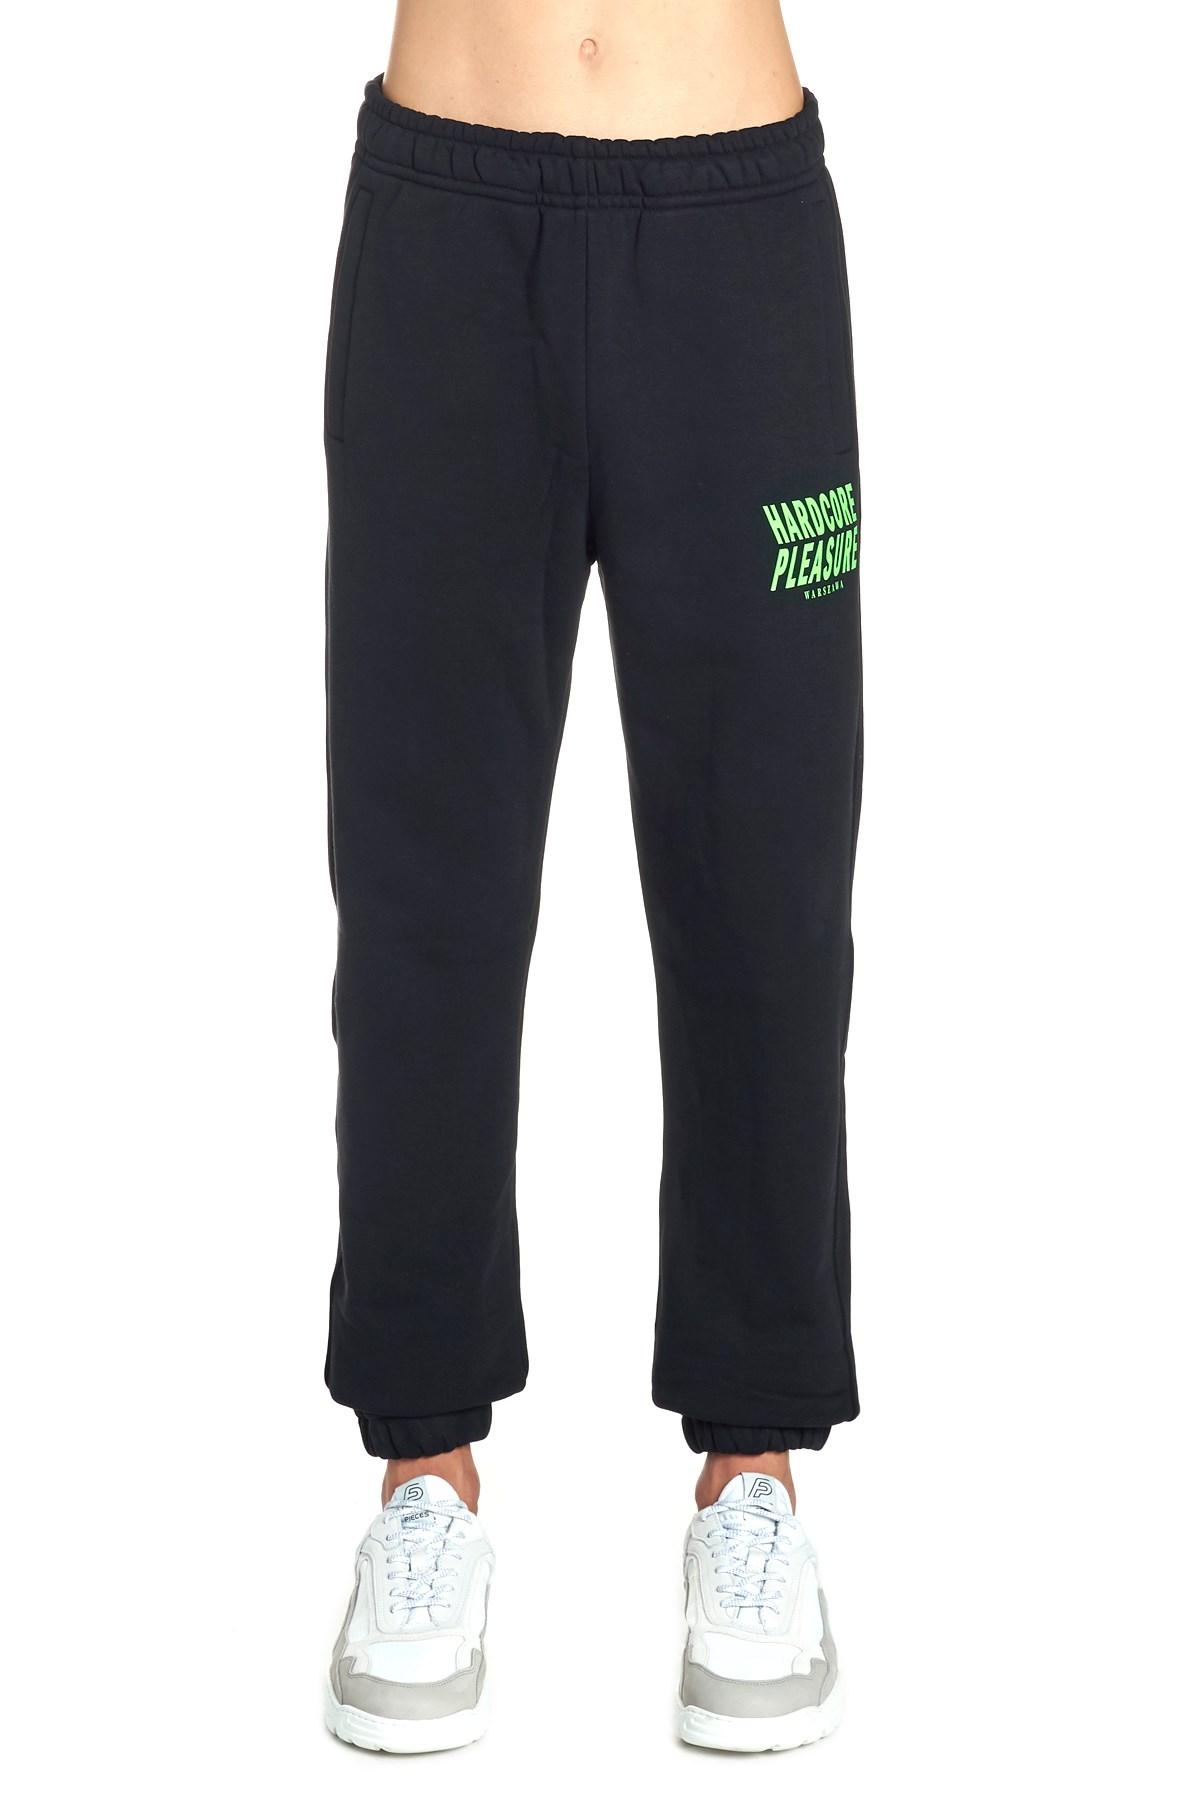 1a8199f369bb Misbhv Hardcore Pleasure Sweatpants Available On Julian Fashion